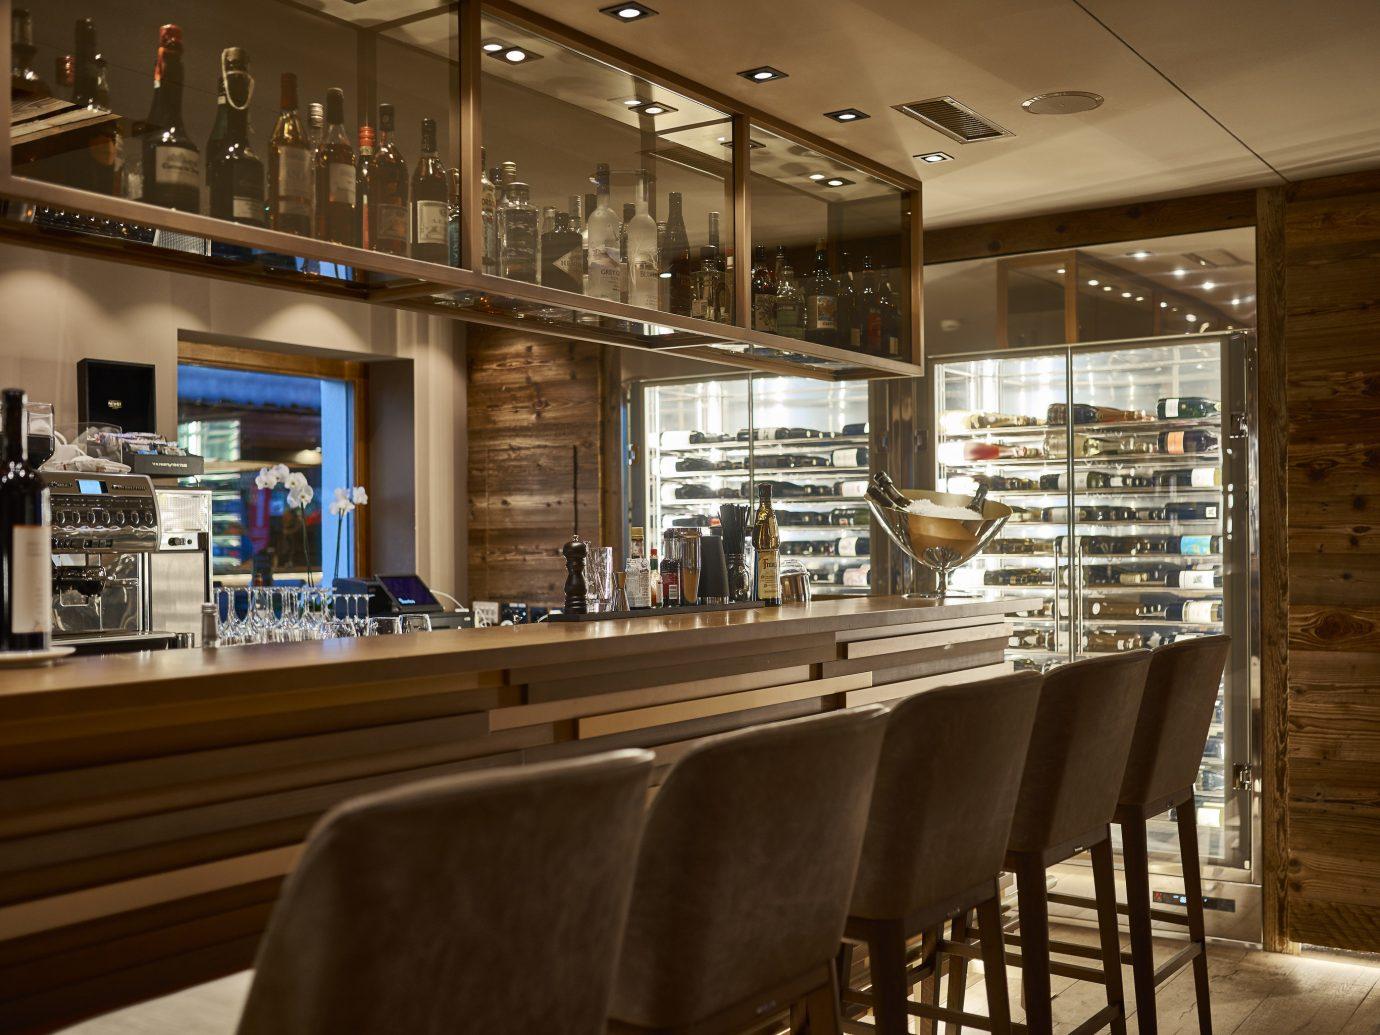 Boutique Hotels Hotels Outdoors + Adventure Winter indoor ceiling floor chair window interior design Bar restaurant café